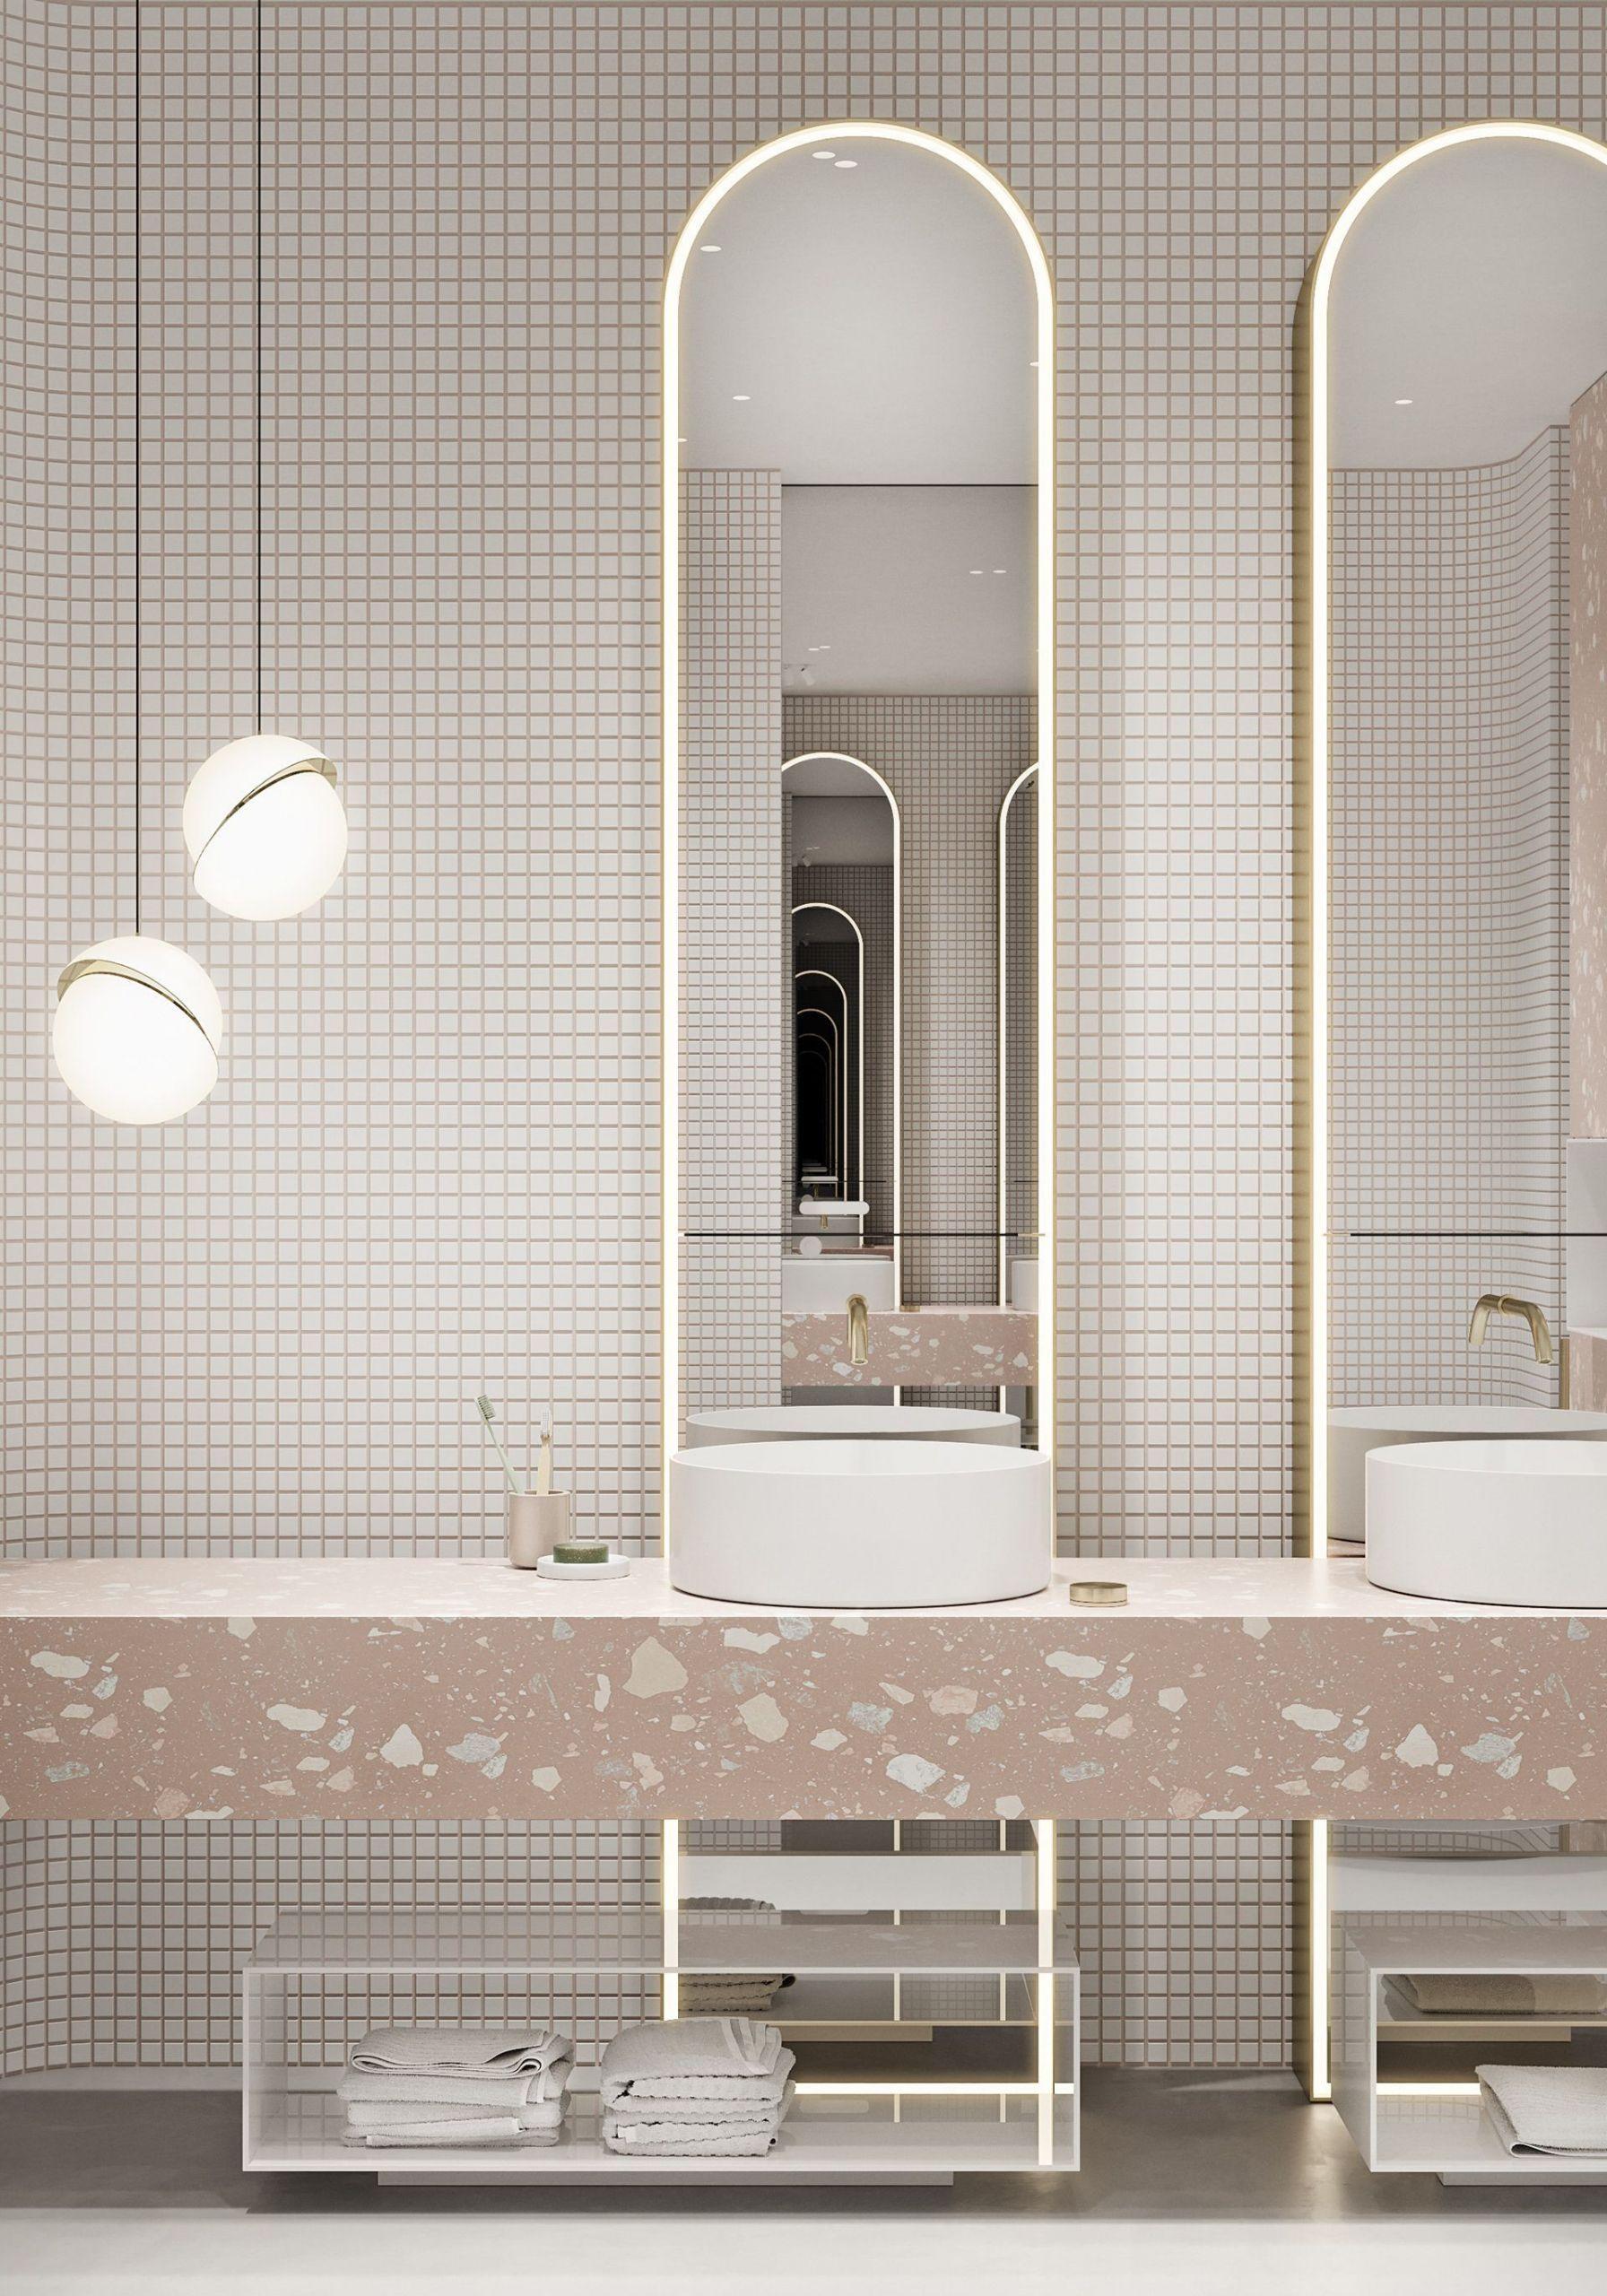 Beau Model Des Salle De Bain En 2020 Salle De Bain Design Idee Salle De Bain Decoration Salle De Bain